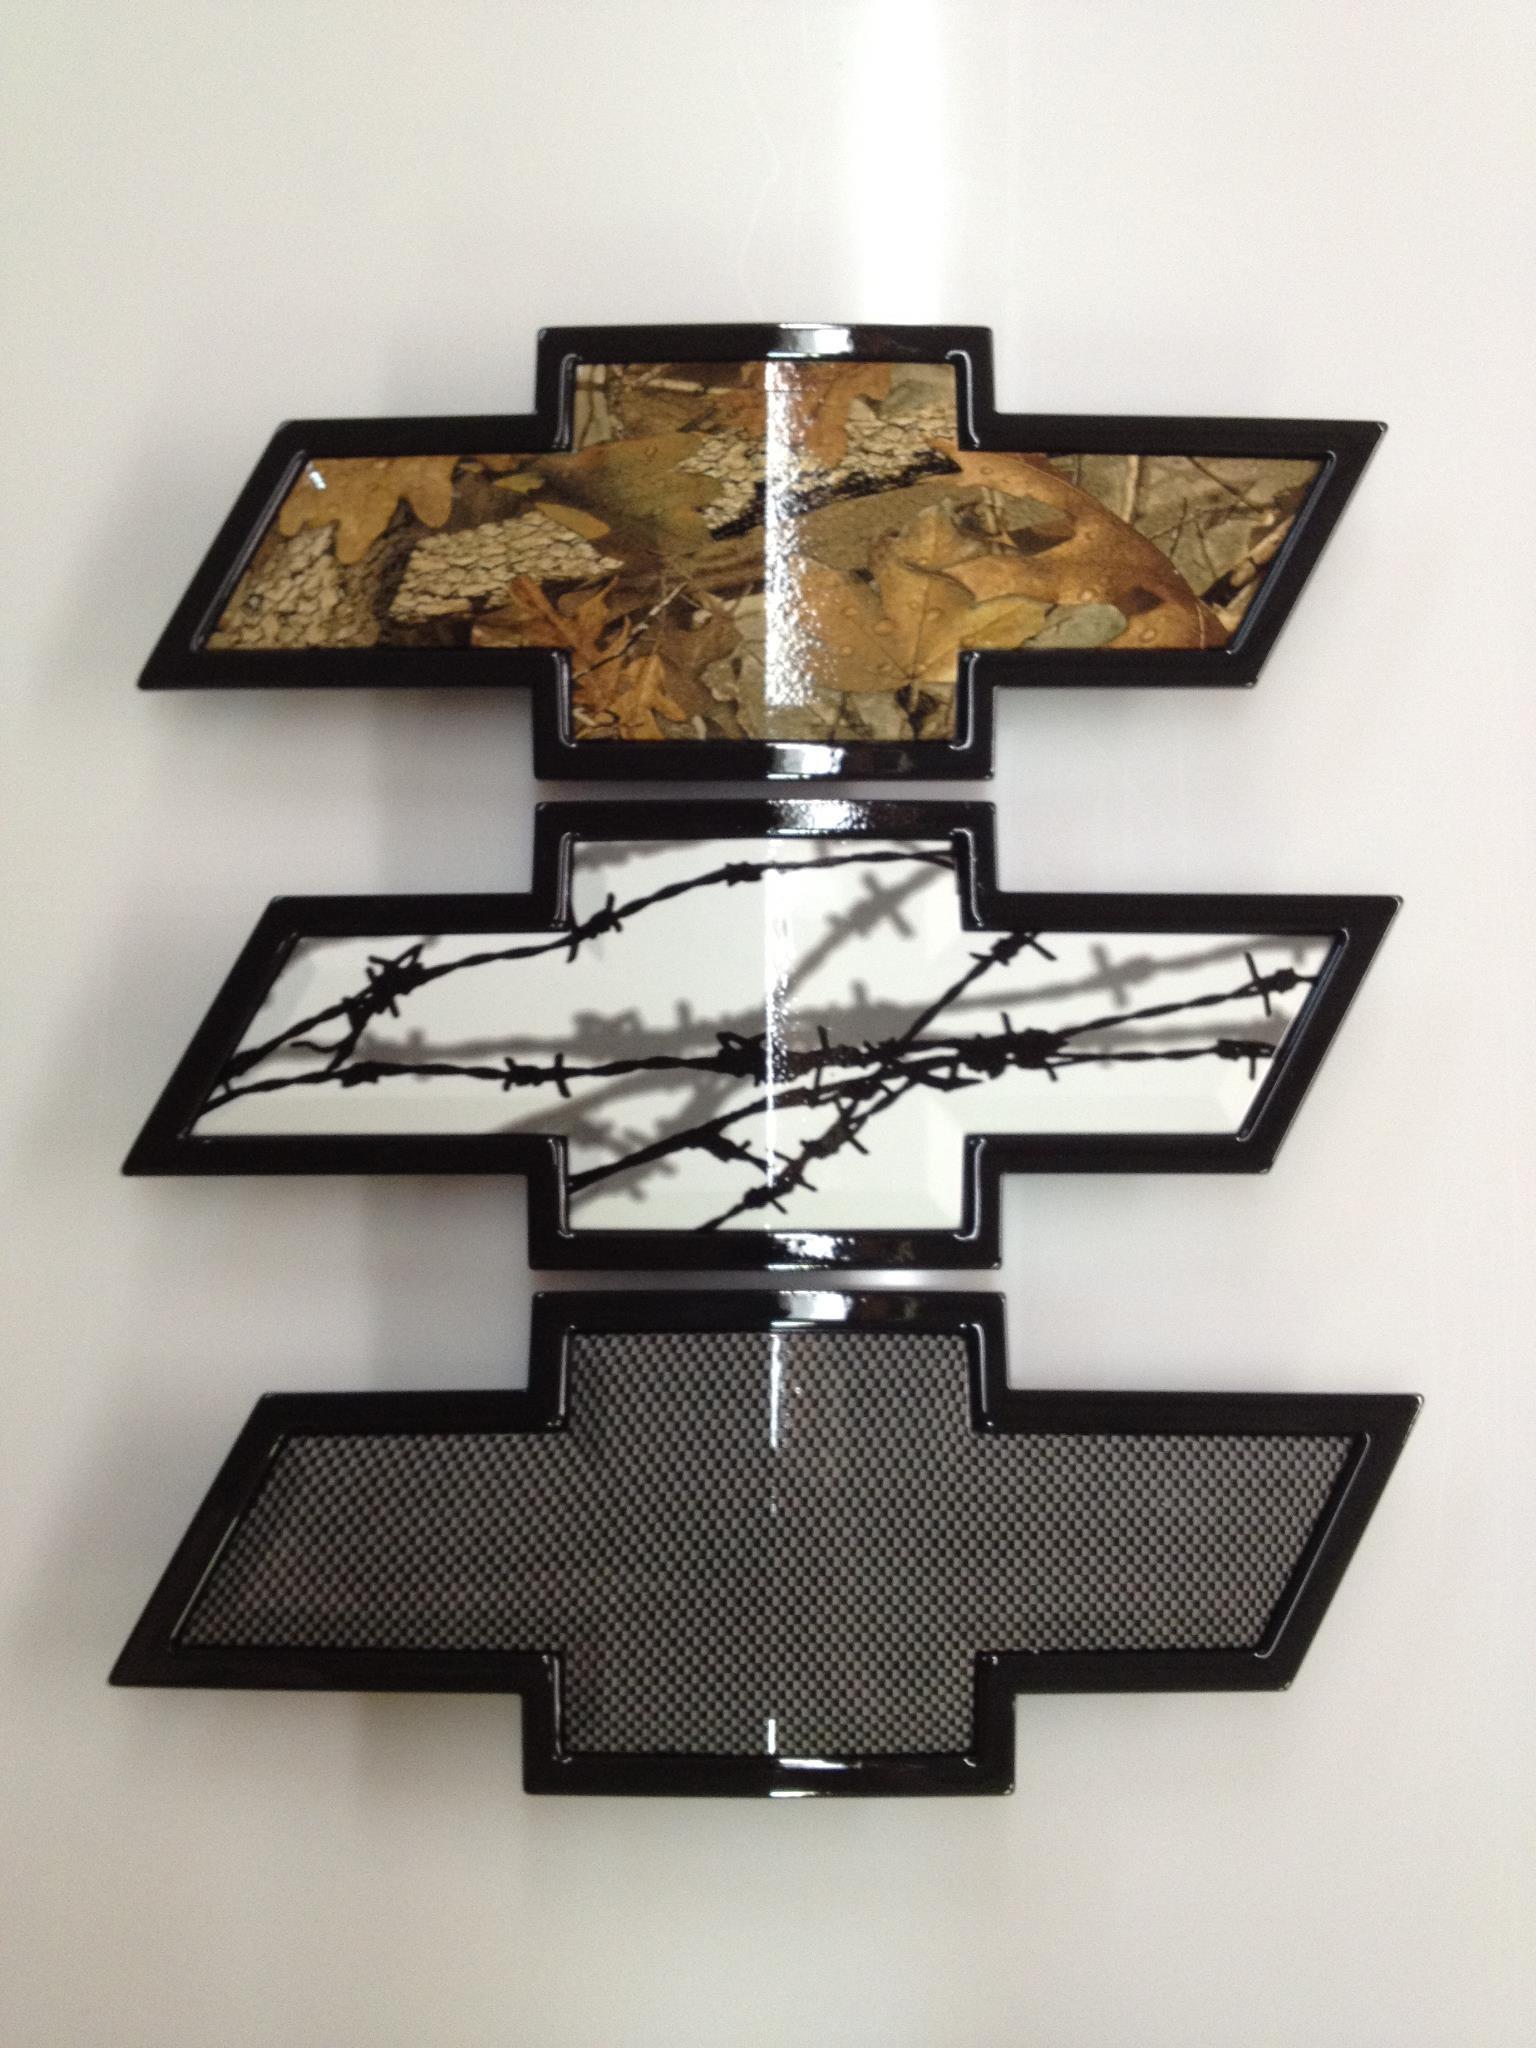 Camo Chevy Emblem Wallpaper Chevy logo camo – viewing